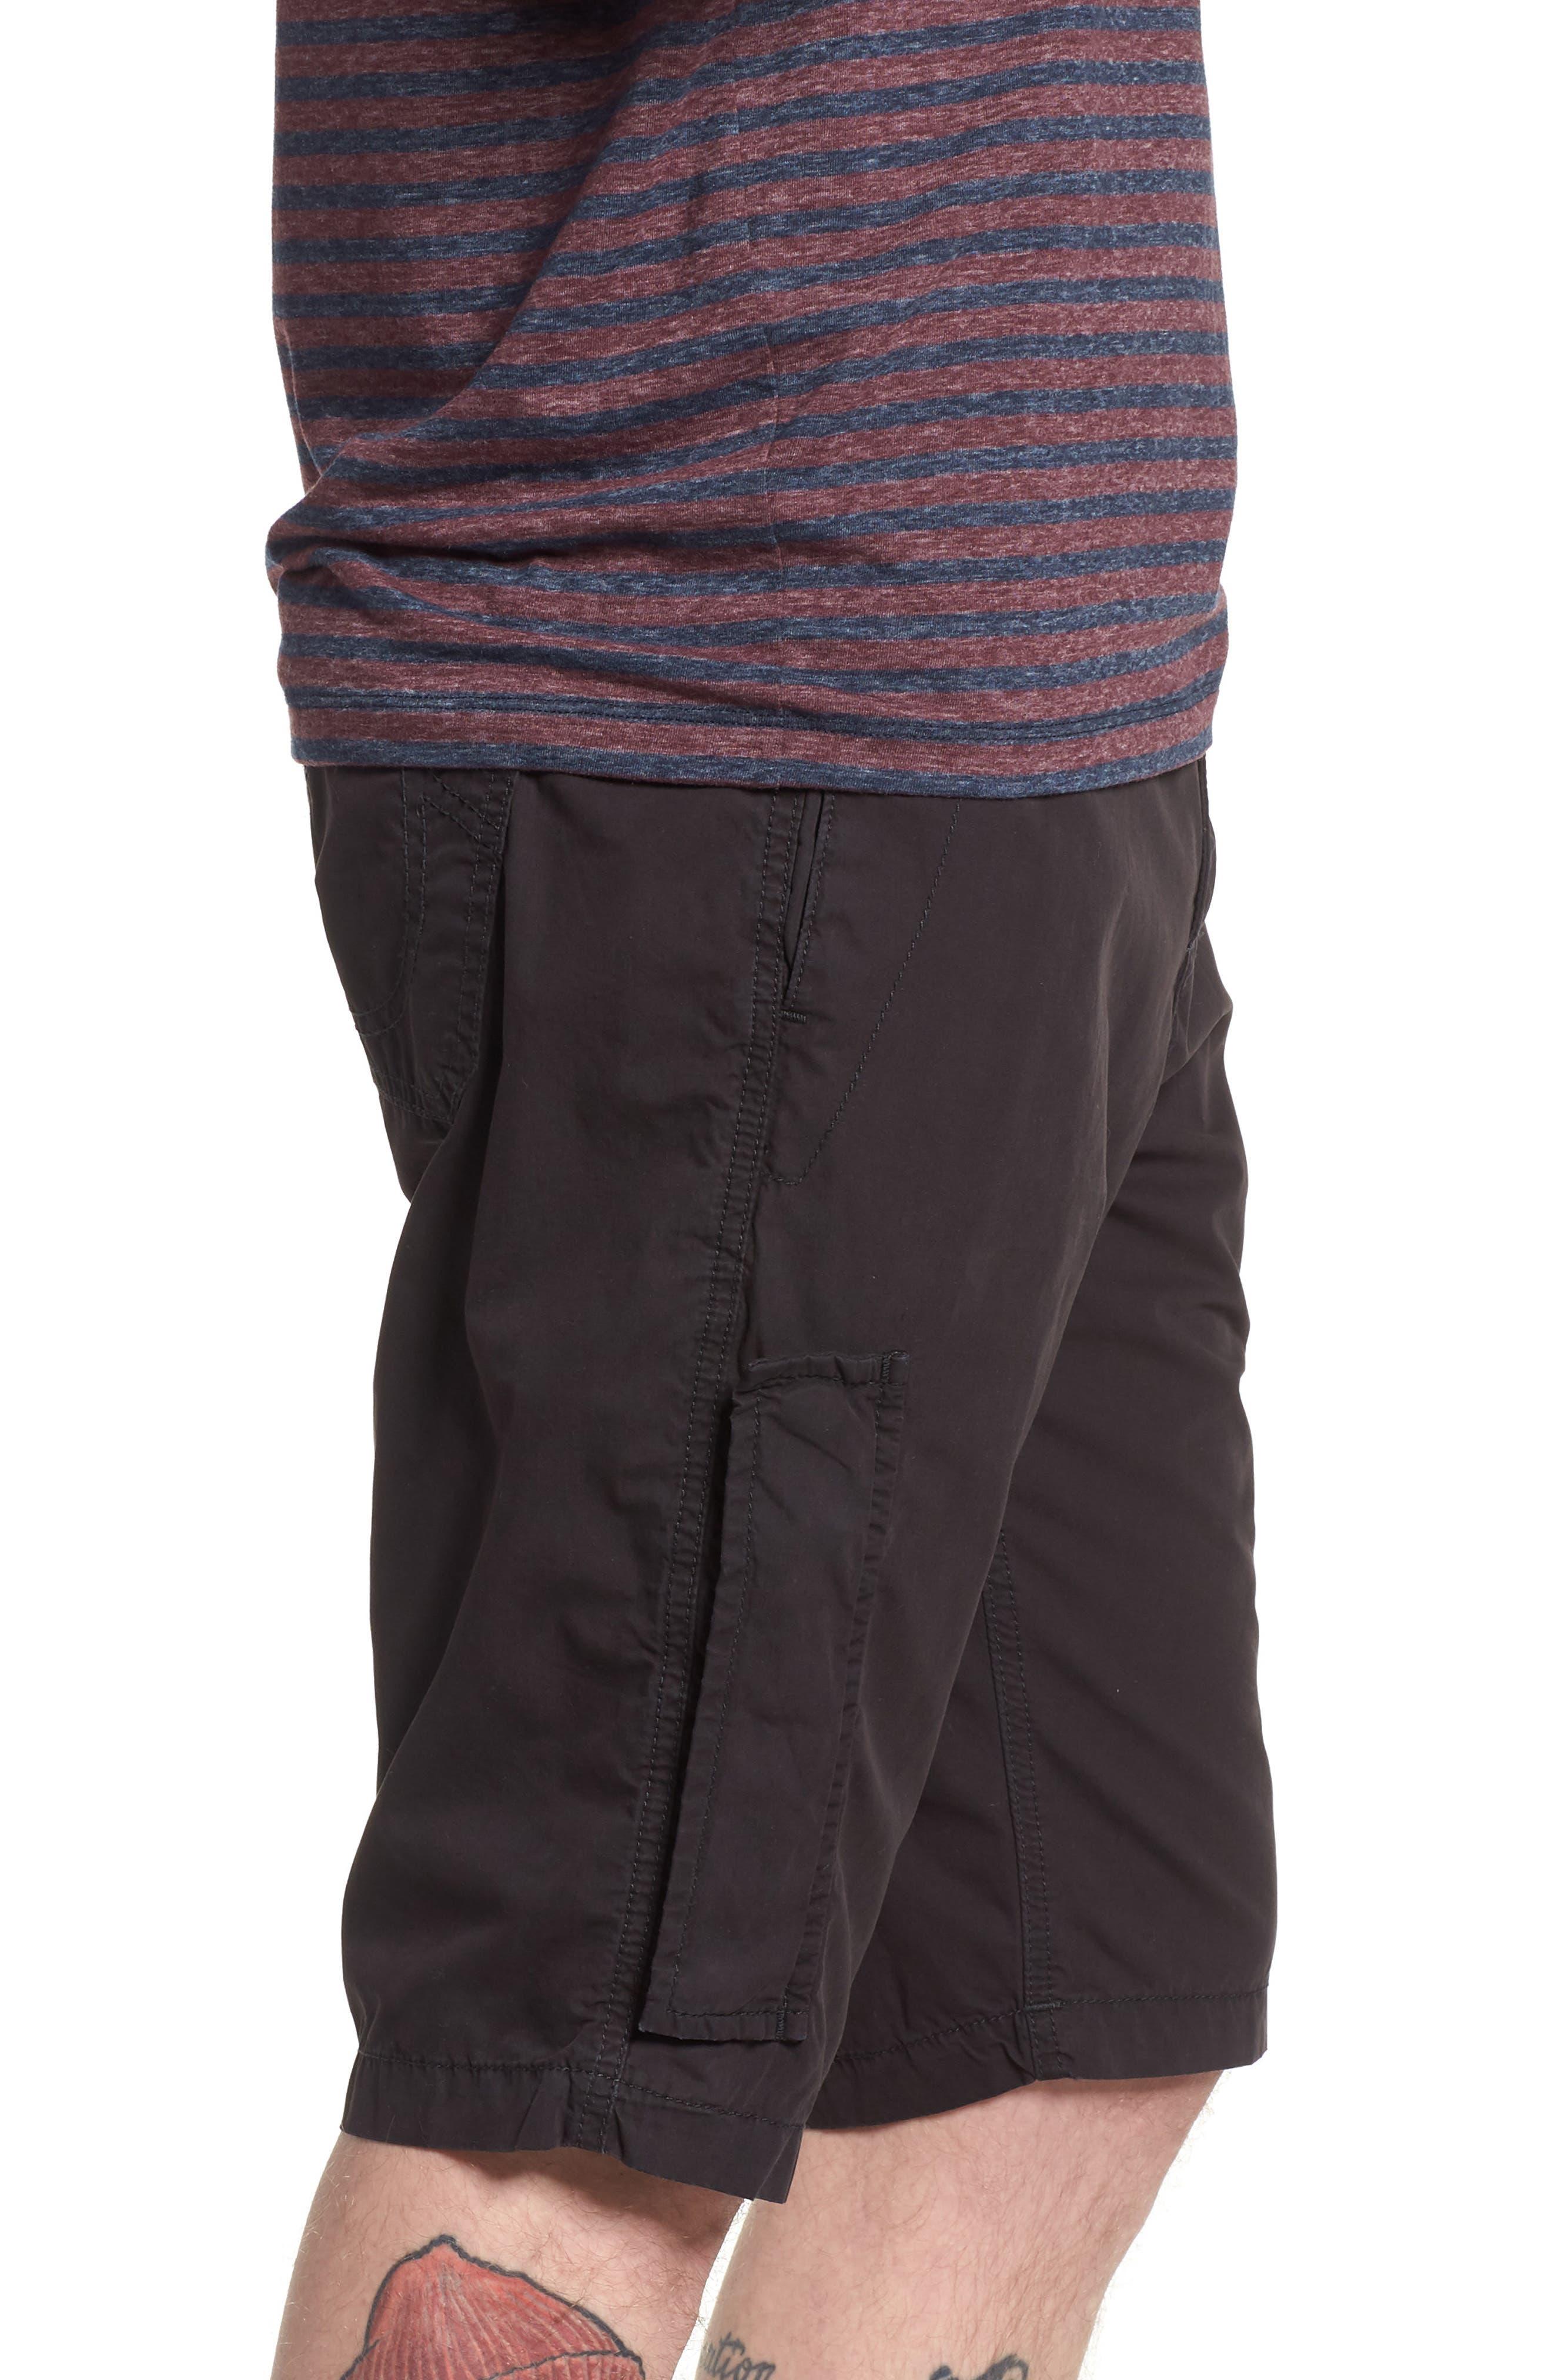 Officer Field Shorts,                             Alternate thumbnail 3, color,                             Black